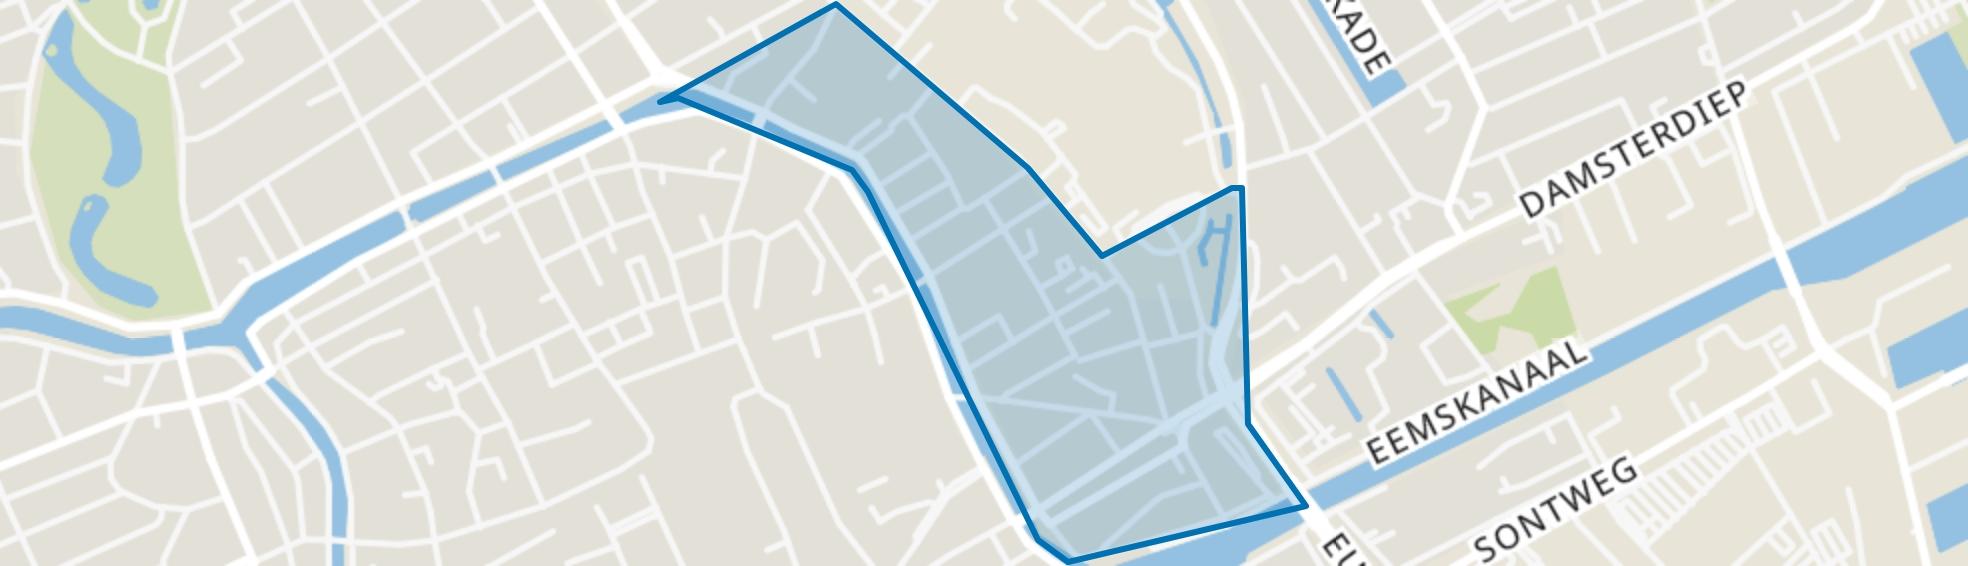 Binnenstad-Oost, Groningen map